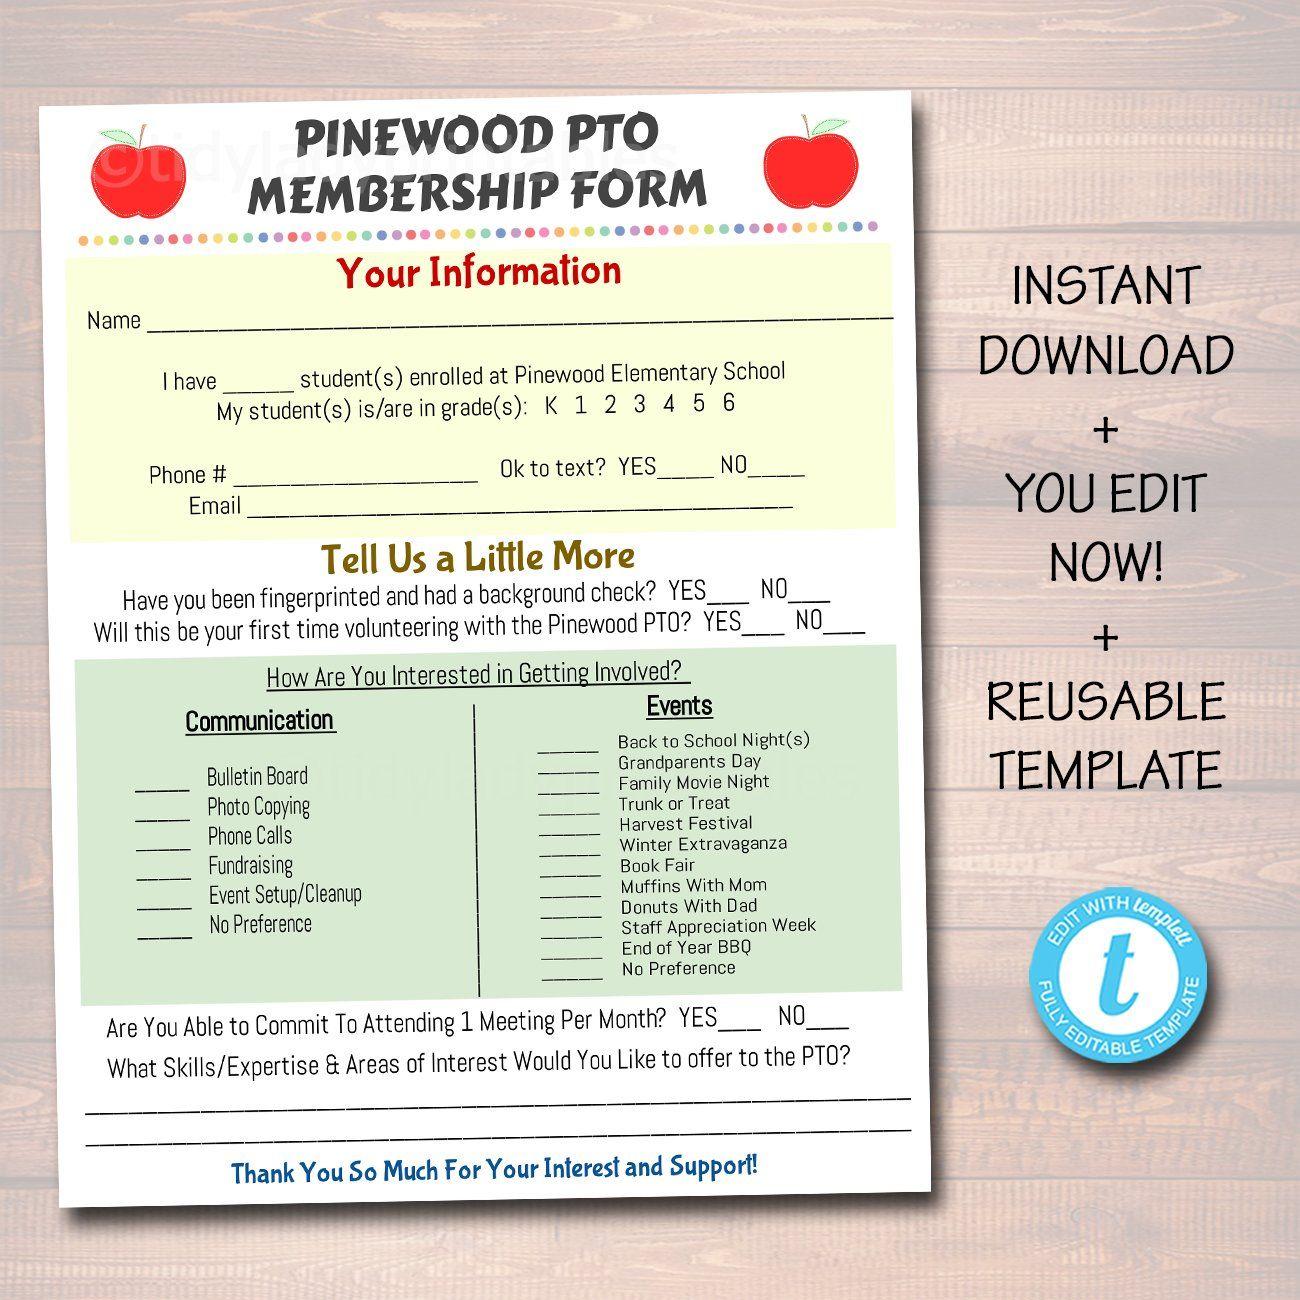 Pto Pta Flyer Printable Handout School Year Fundraiser Event Meeting Sponsorship Volunteer Signup Form Template In 2021 School Fundraisers Pta Membership Pta Organization Pta meeting sign in sheet